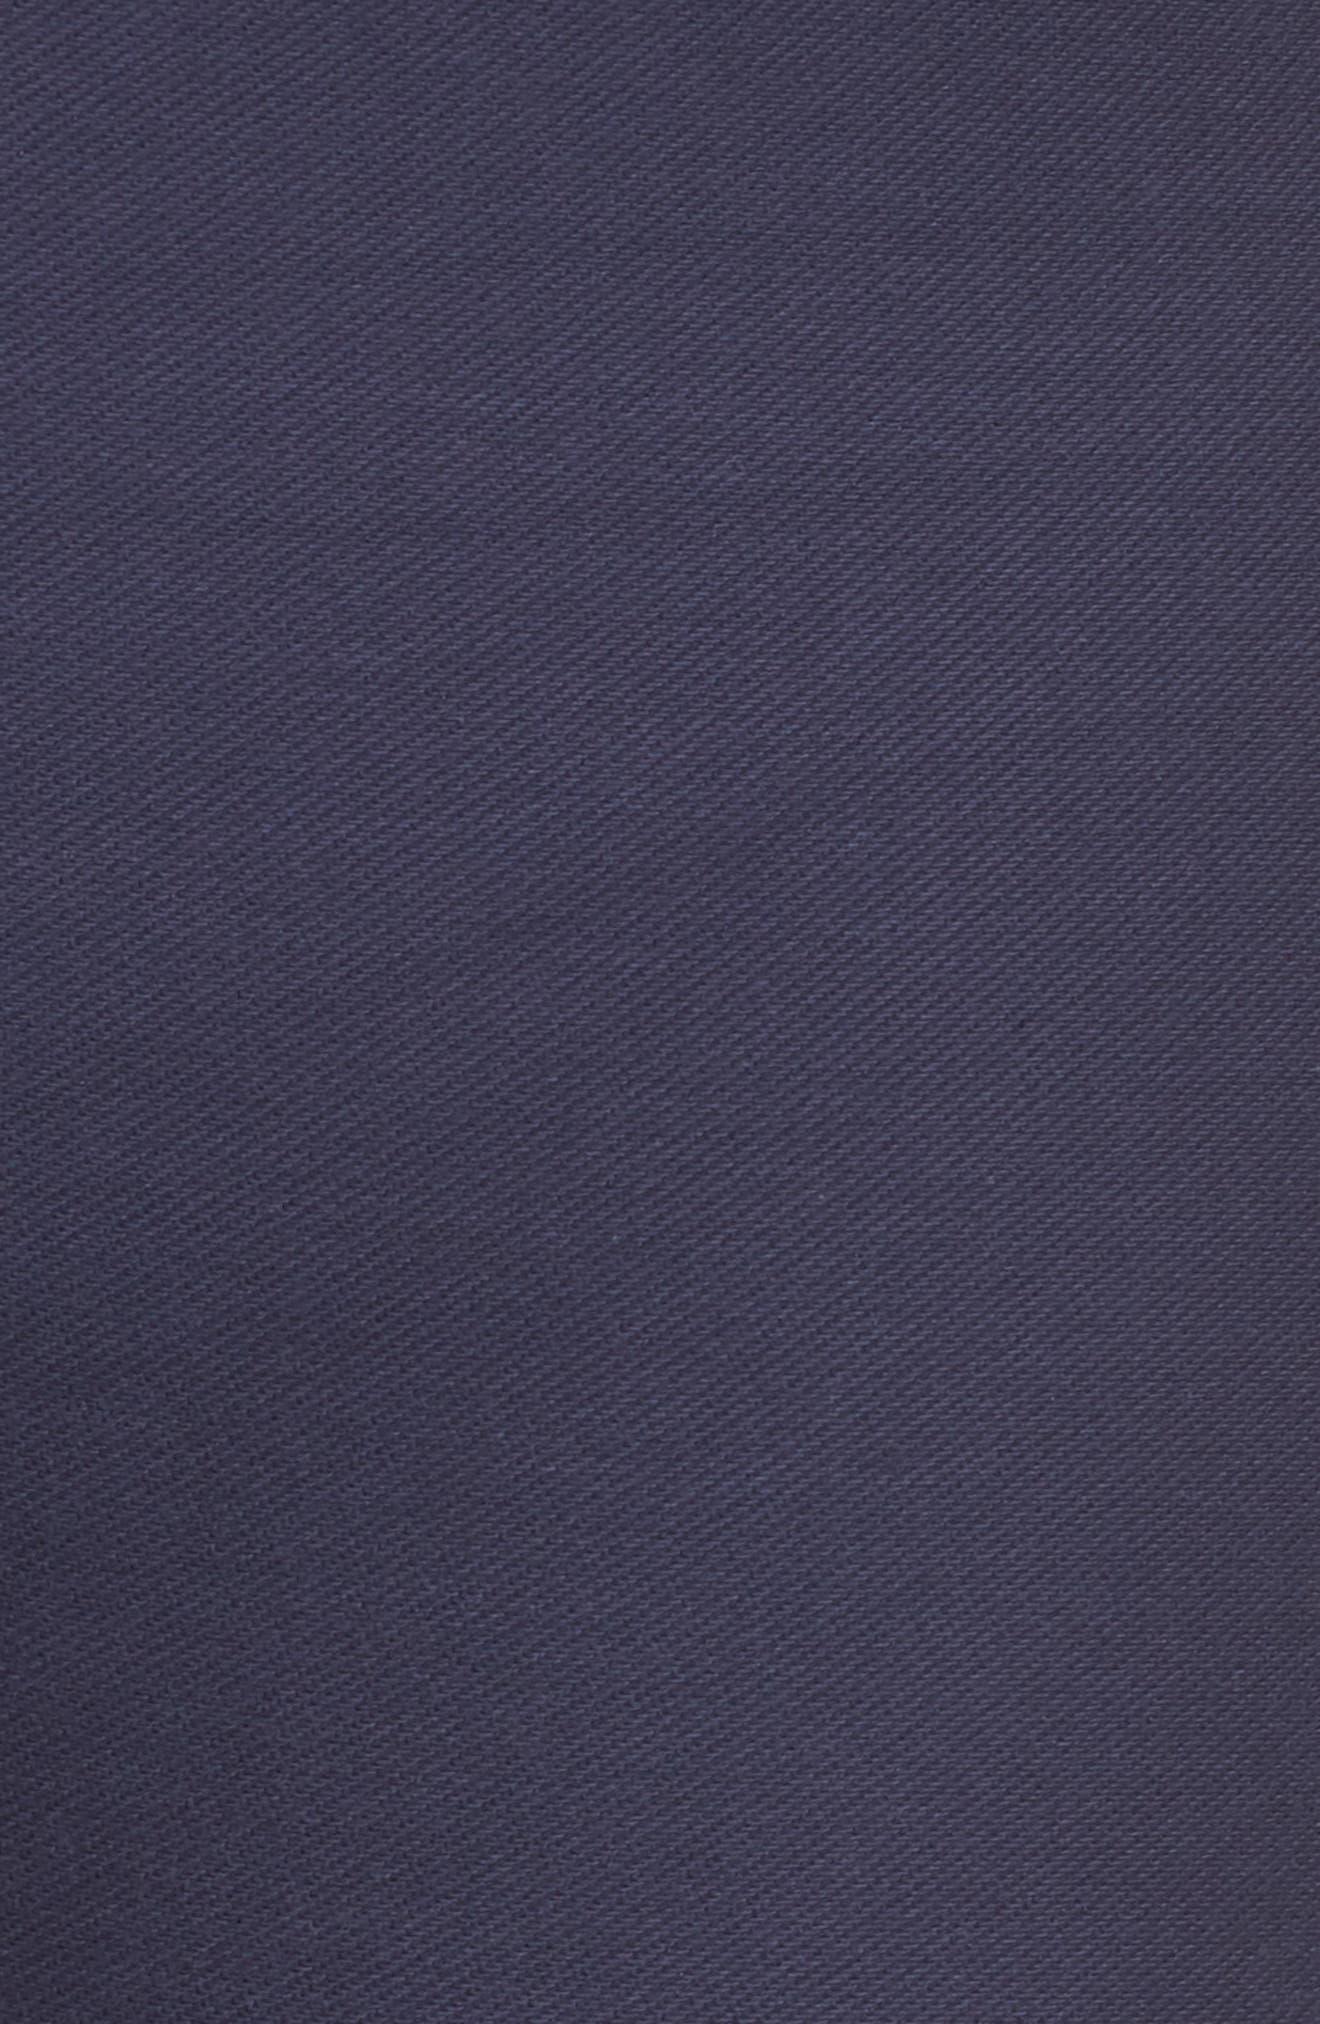 Embellished Cuff Leggings,                             Alternate thumbnail 6, color,                             True Navy